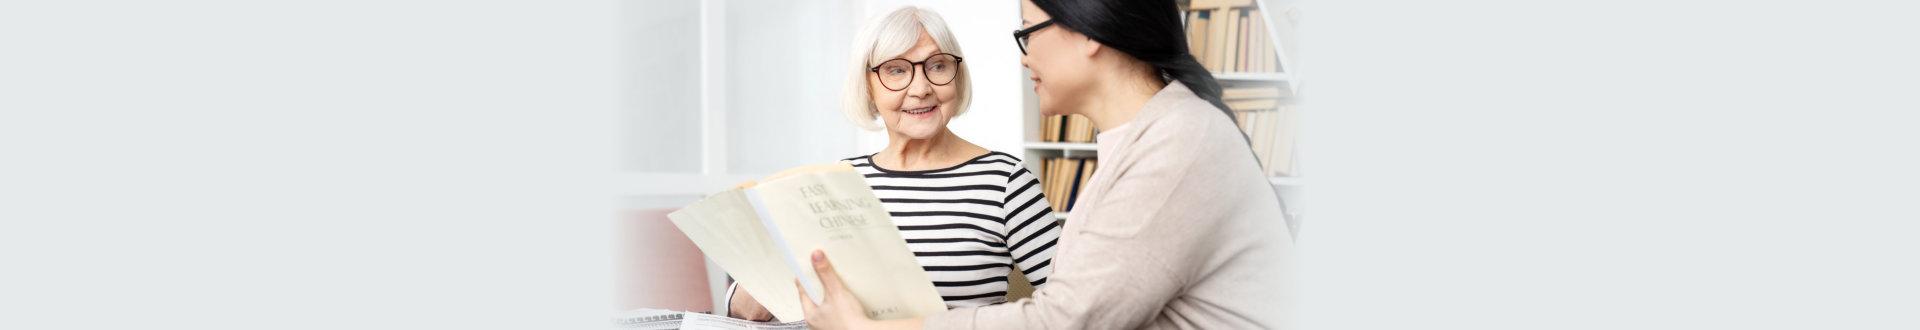 senior and caregiver talking